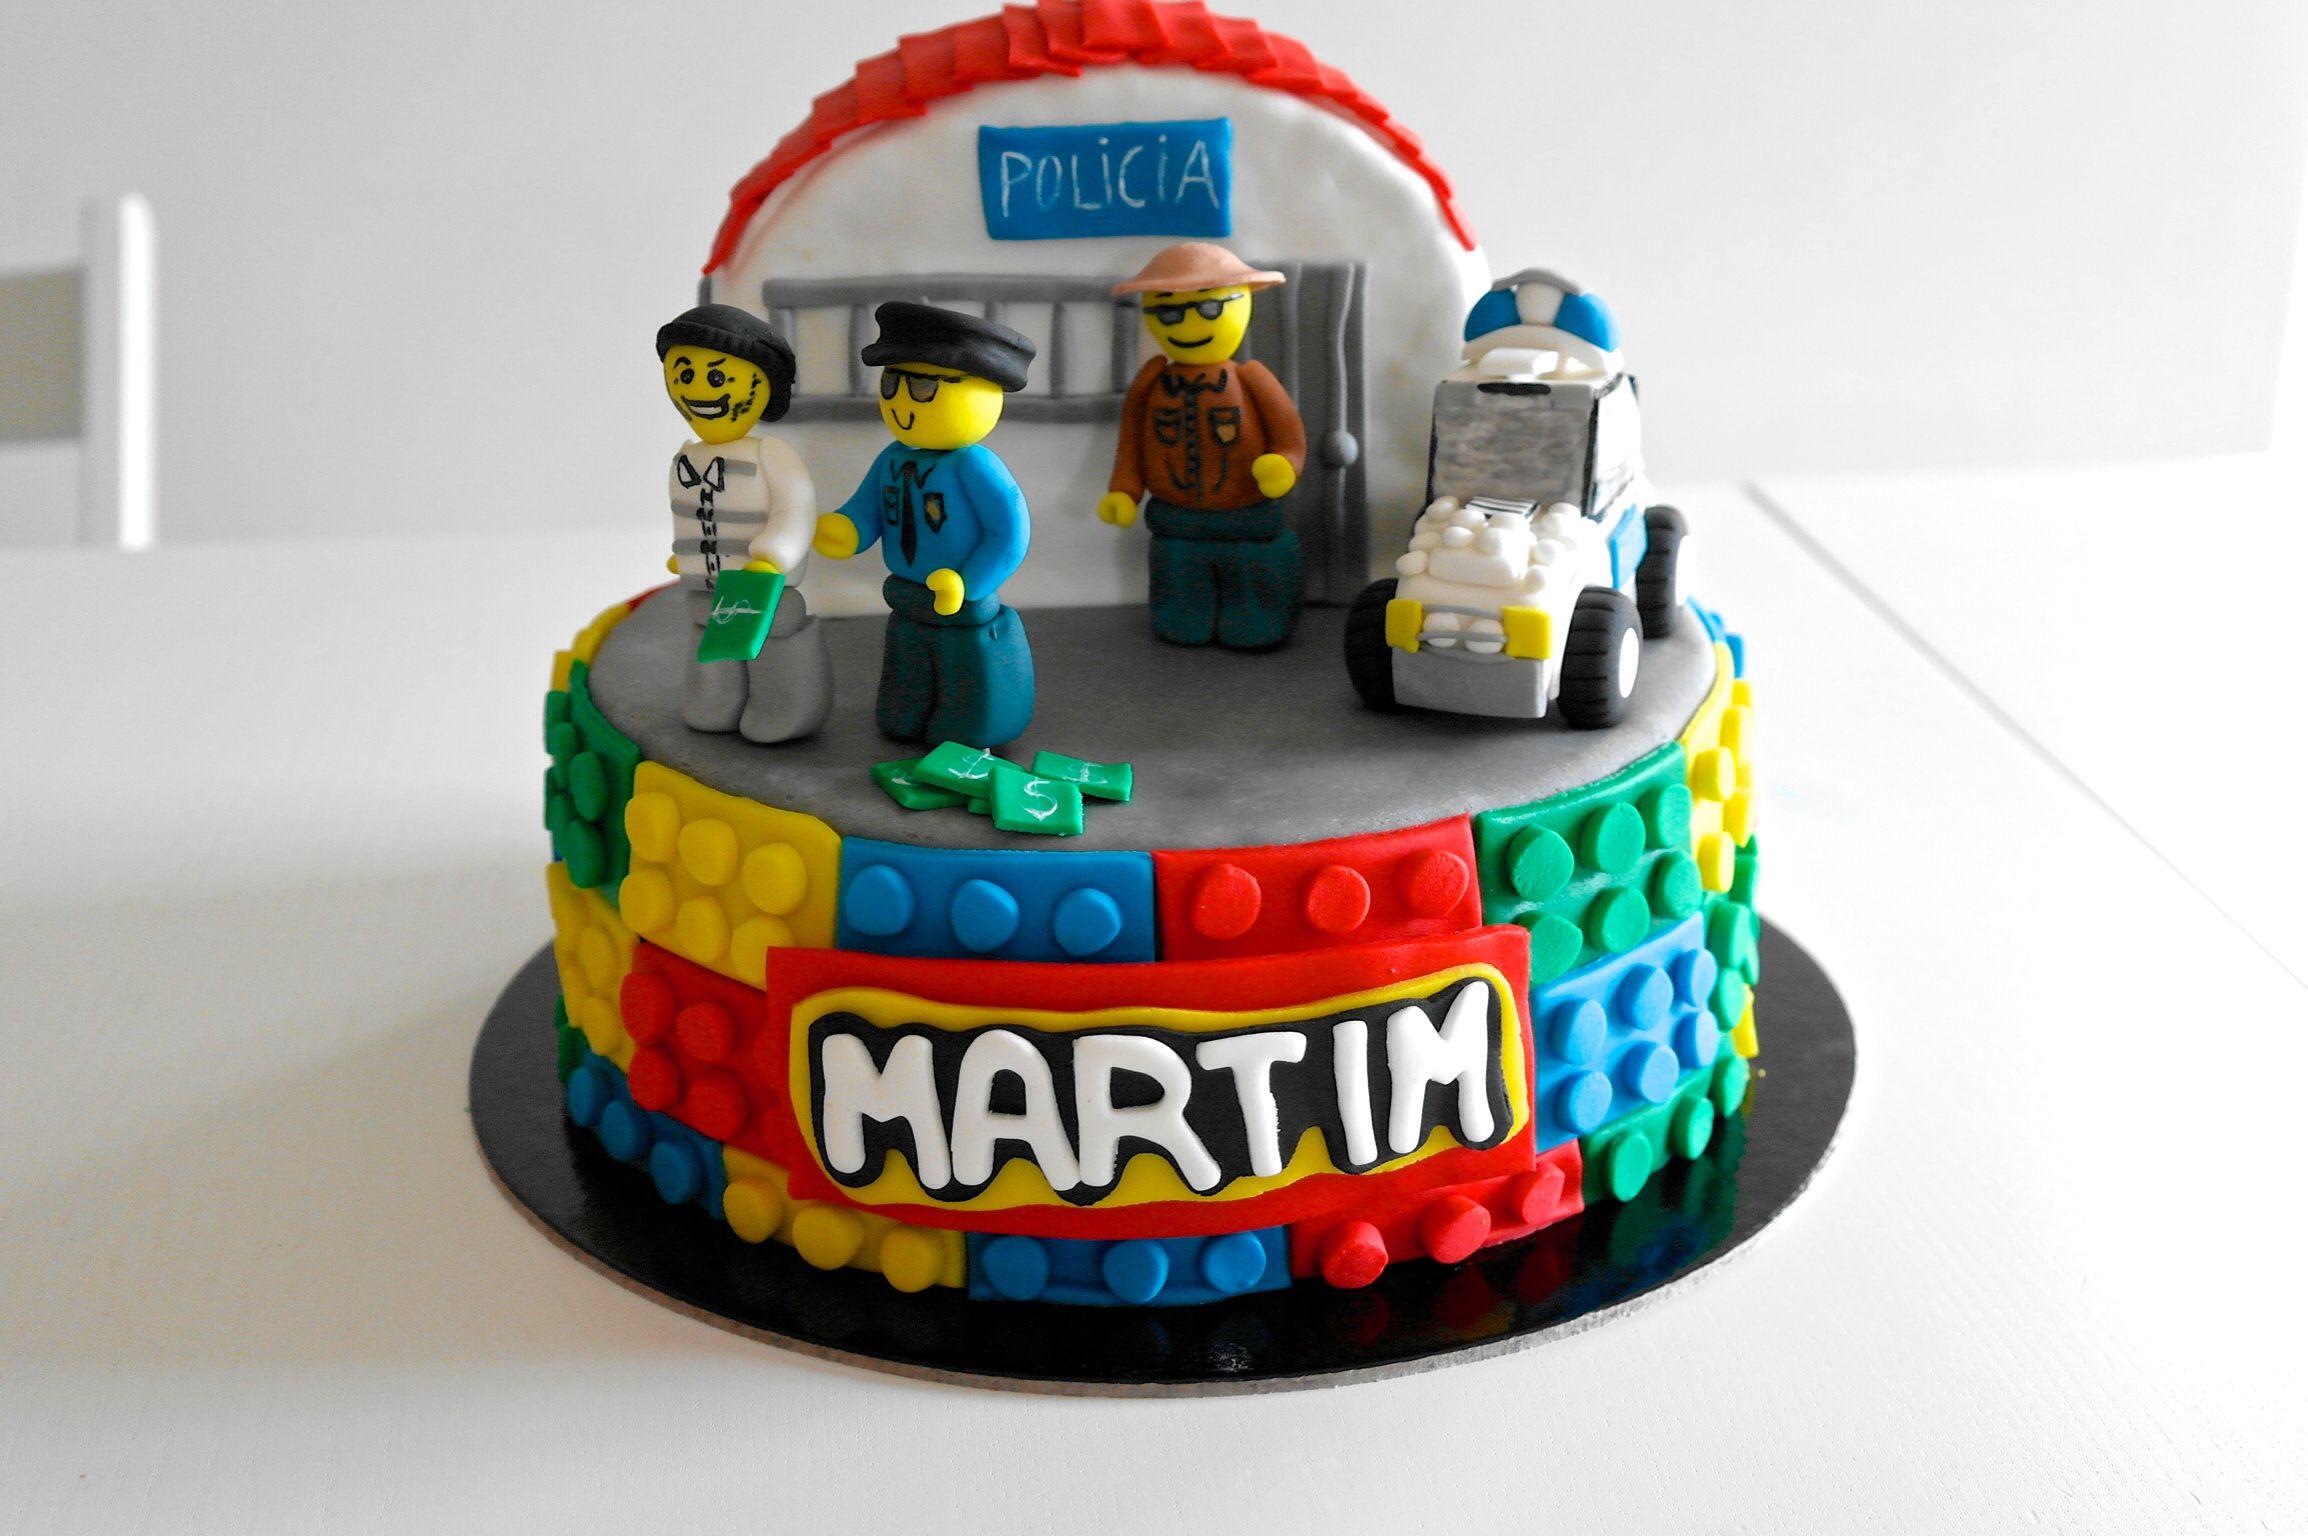 Pin By Joana Vale On My Cakes Lego Cake Police Cakes Cake Design